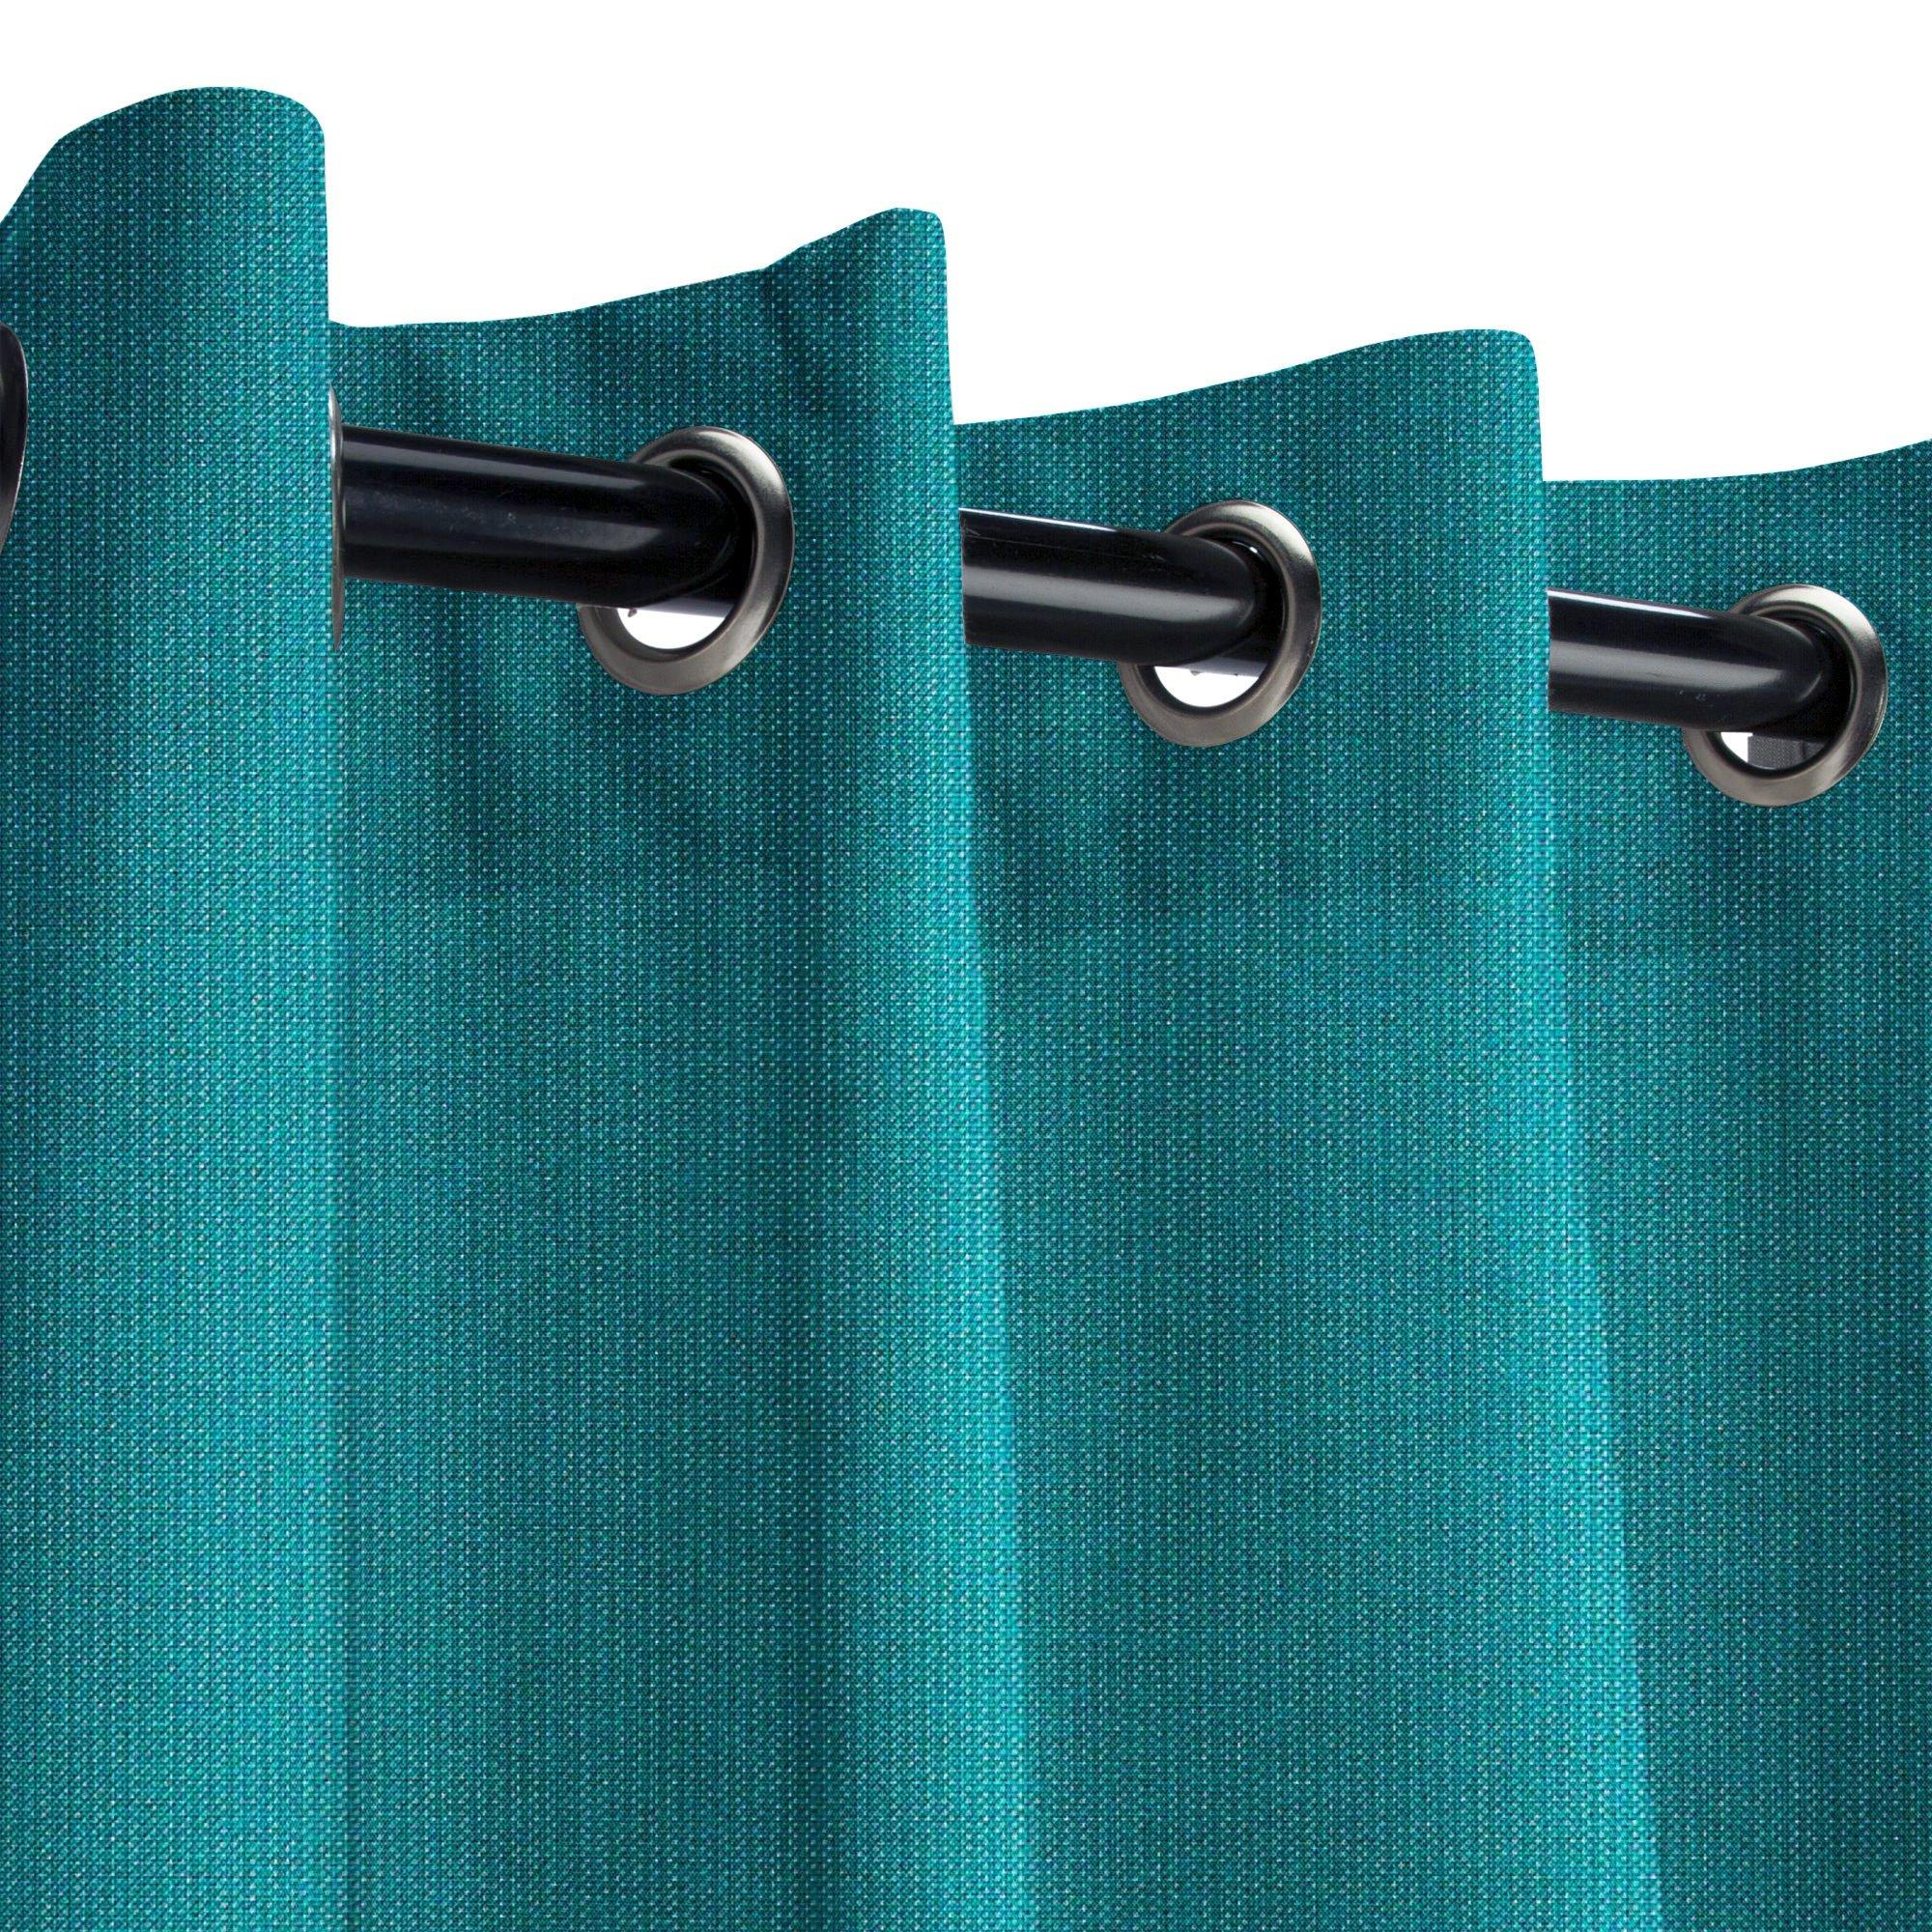 Sunbrella Spectrum Peacock Outdoor Curtain with Nickel Grommets 50 in. Wide x 108 in. Long